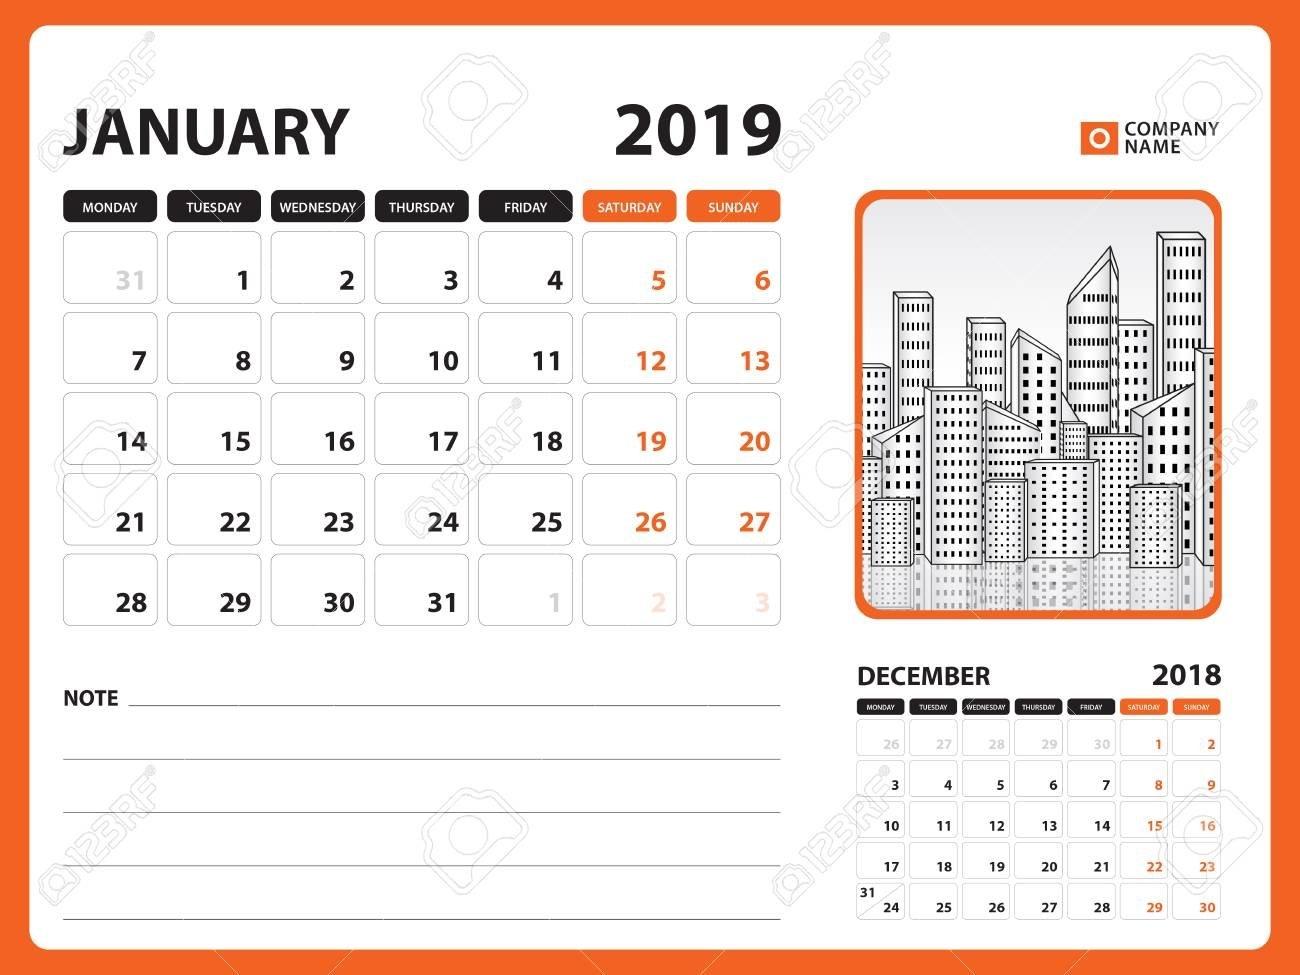 Desk Calendar For January 2019 Template, Printable Calendar Calendar 2019 Desk